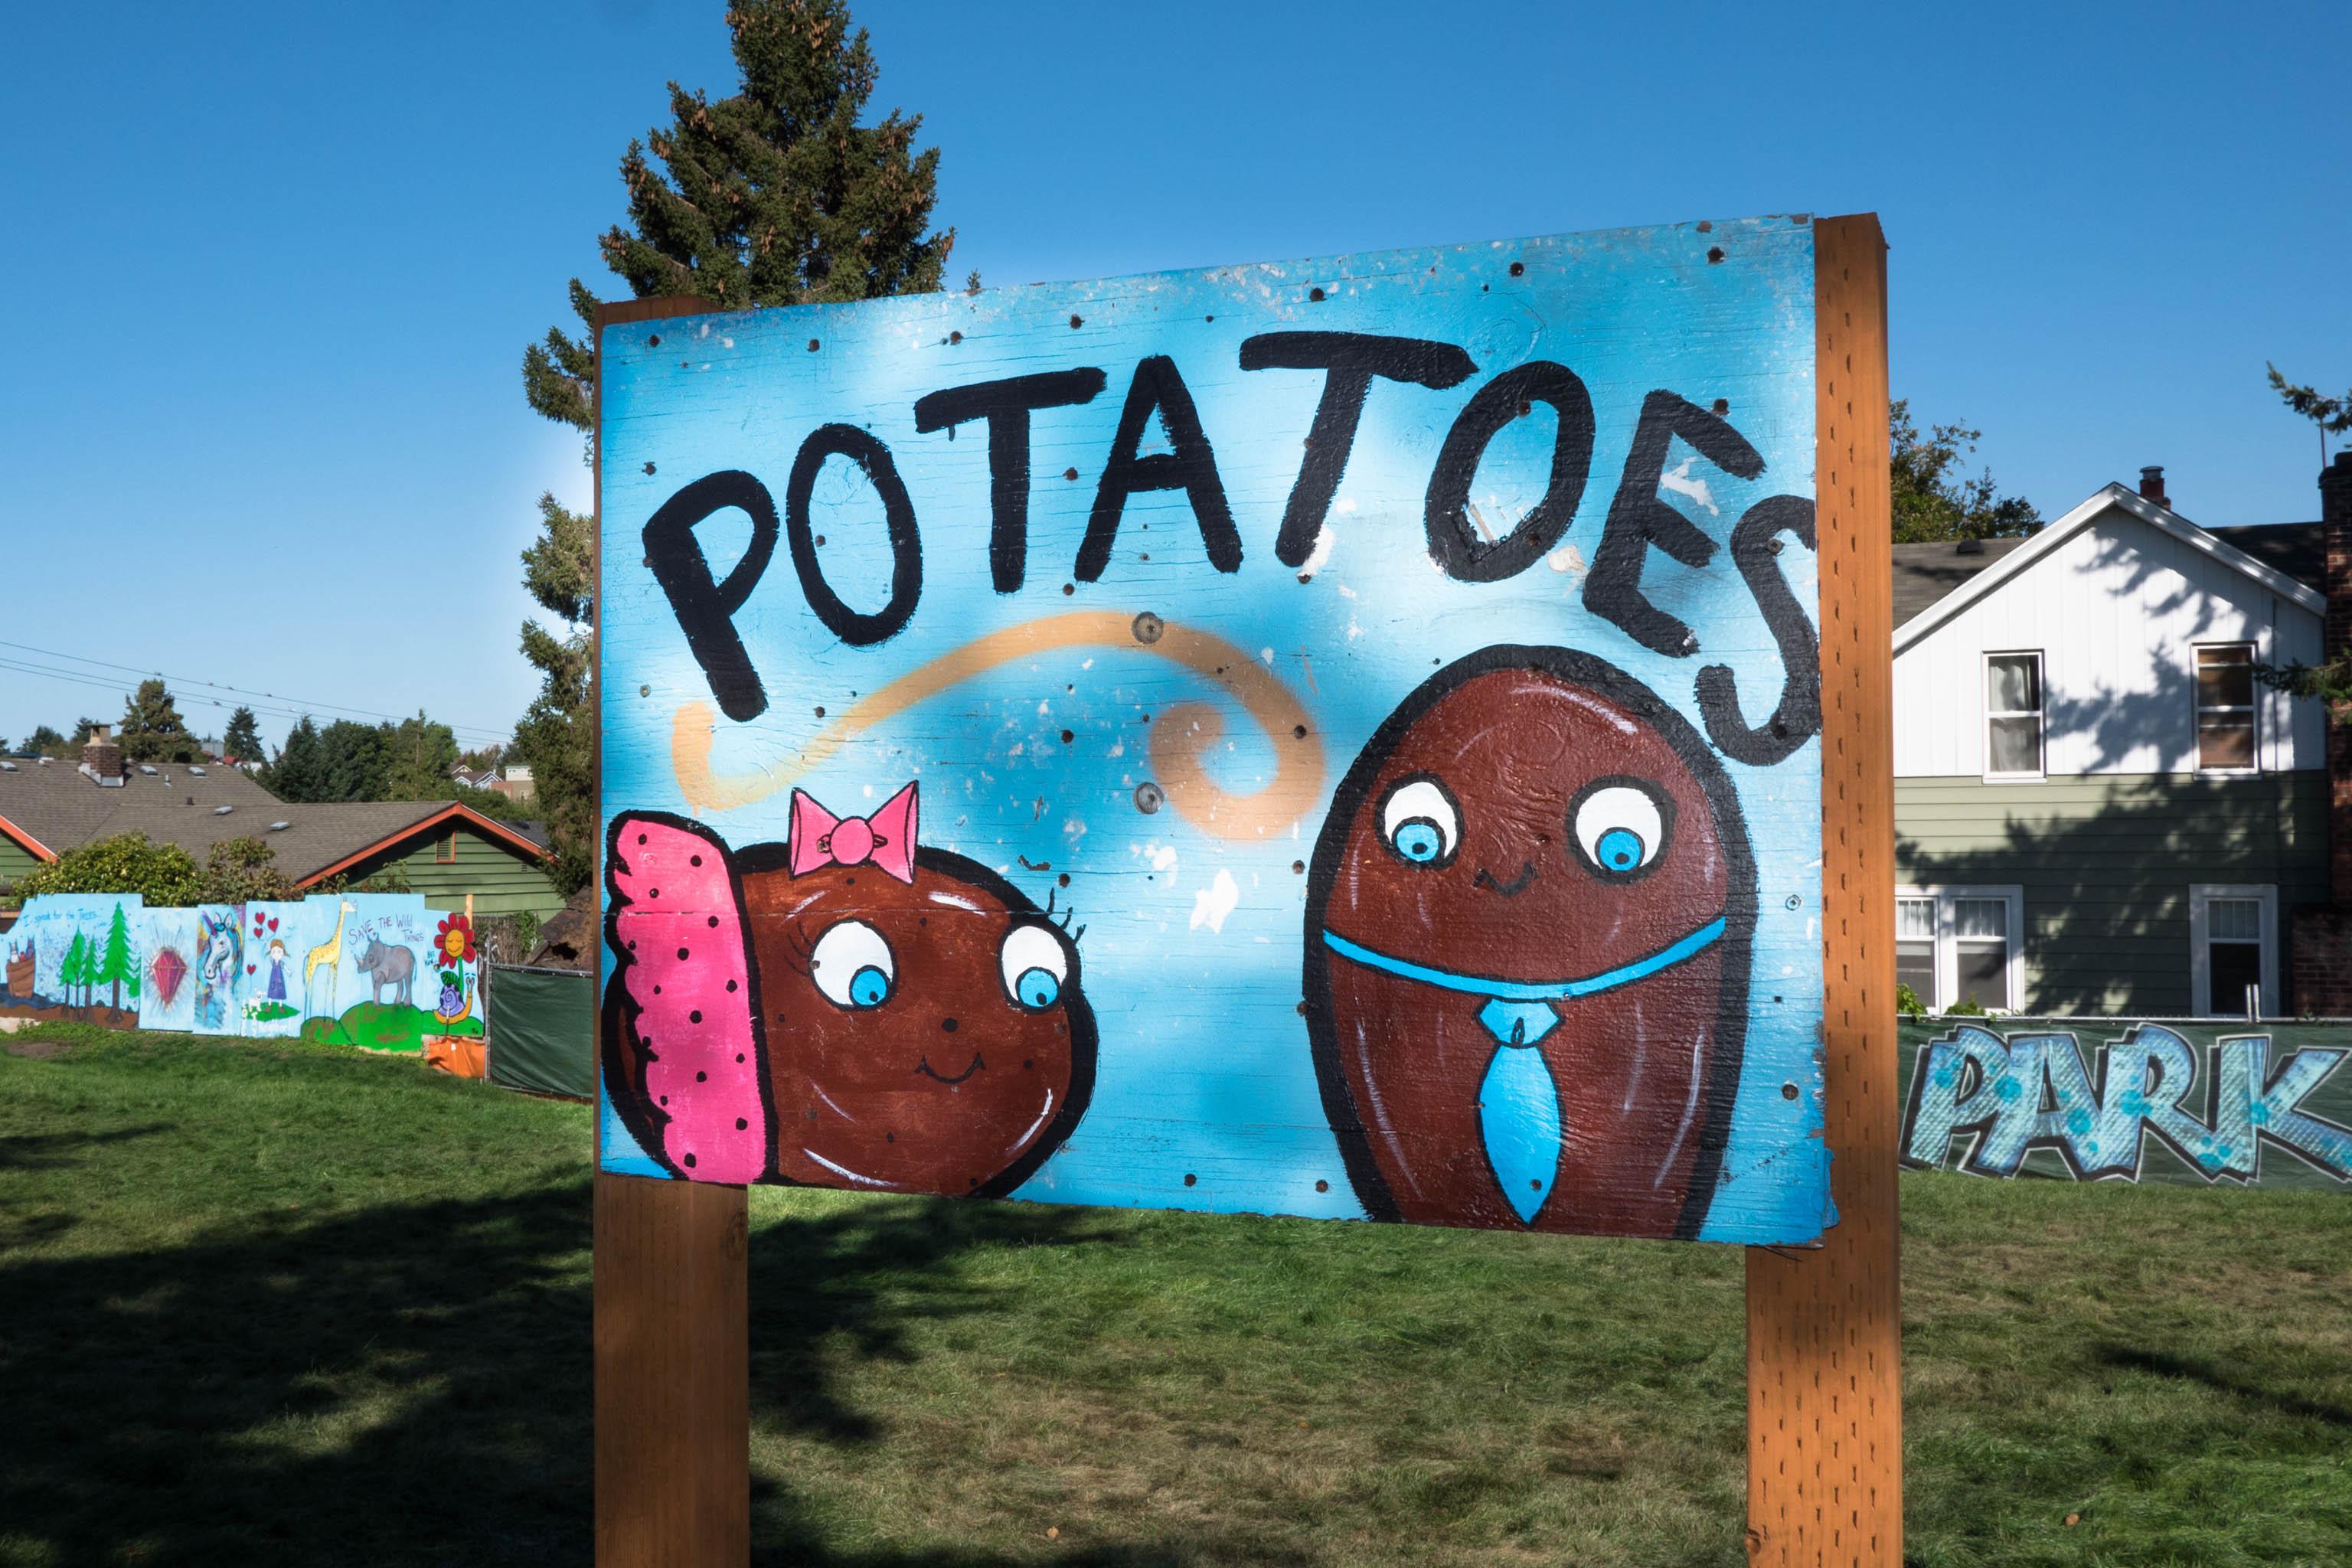 Seattle, art, greenwood, greenwood park, kid art, kid mural, murals, park